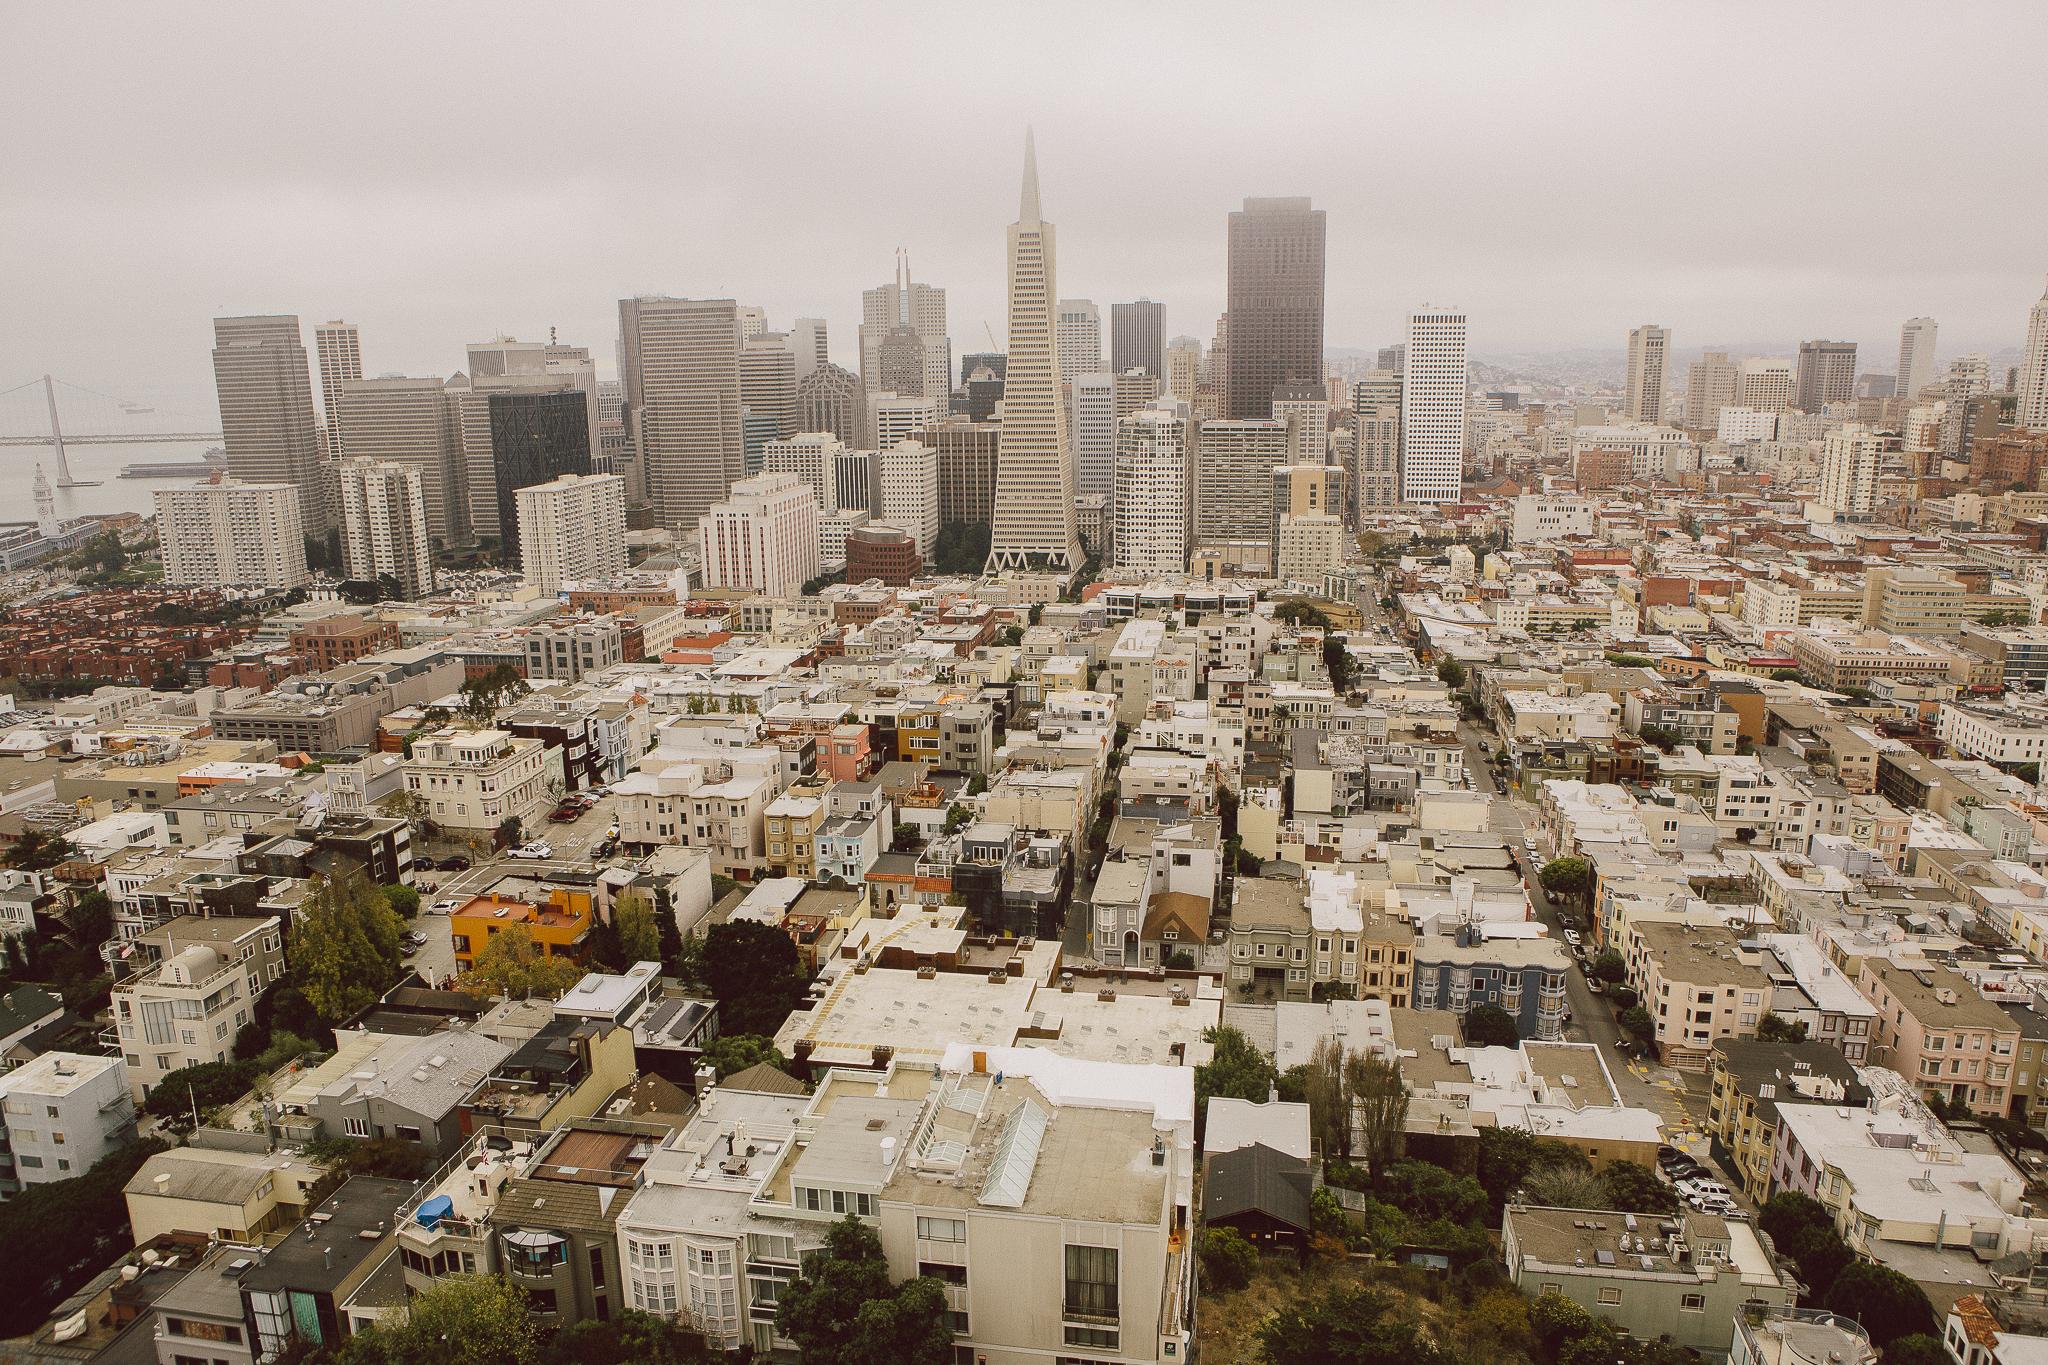 San Francisco city photography